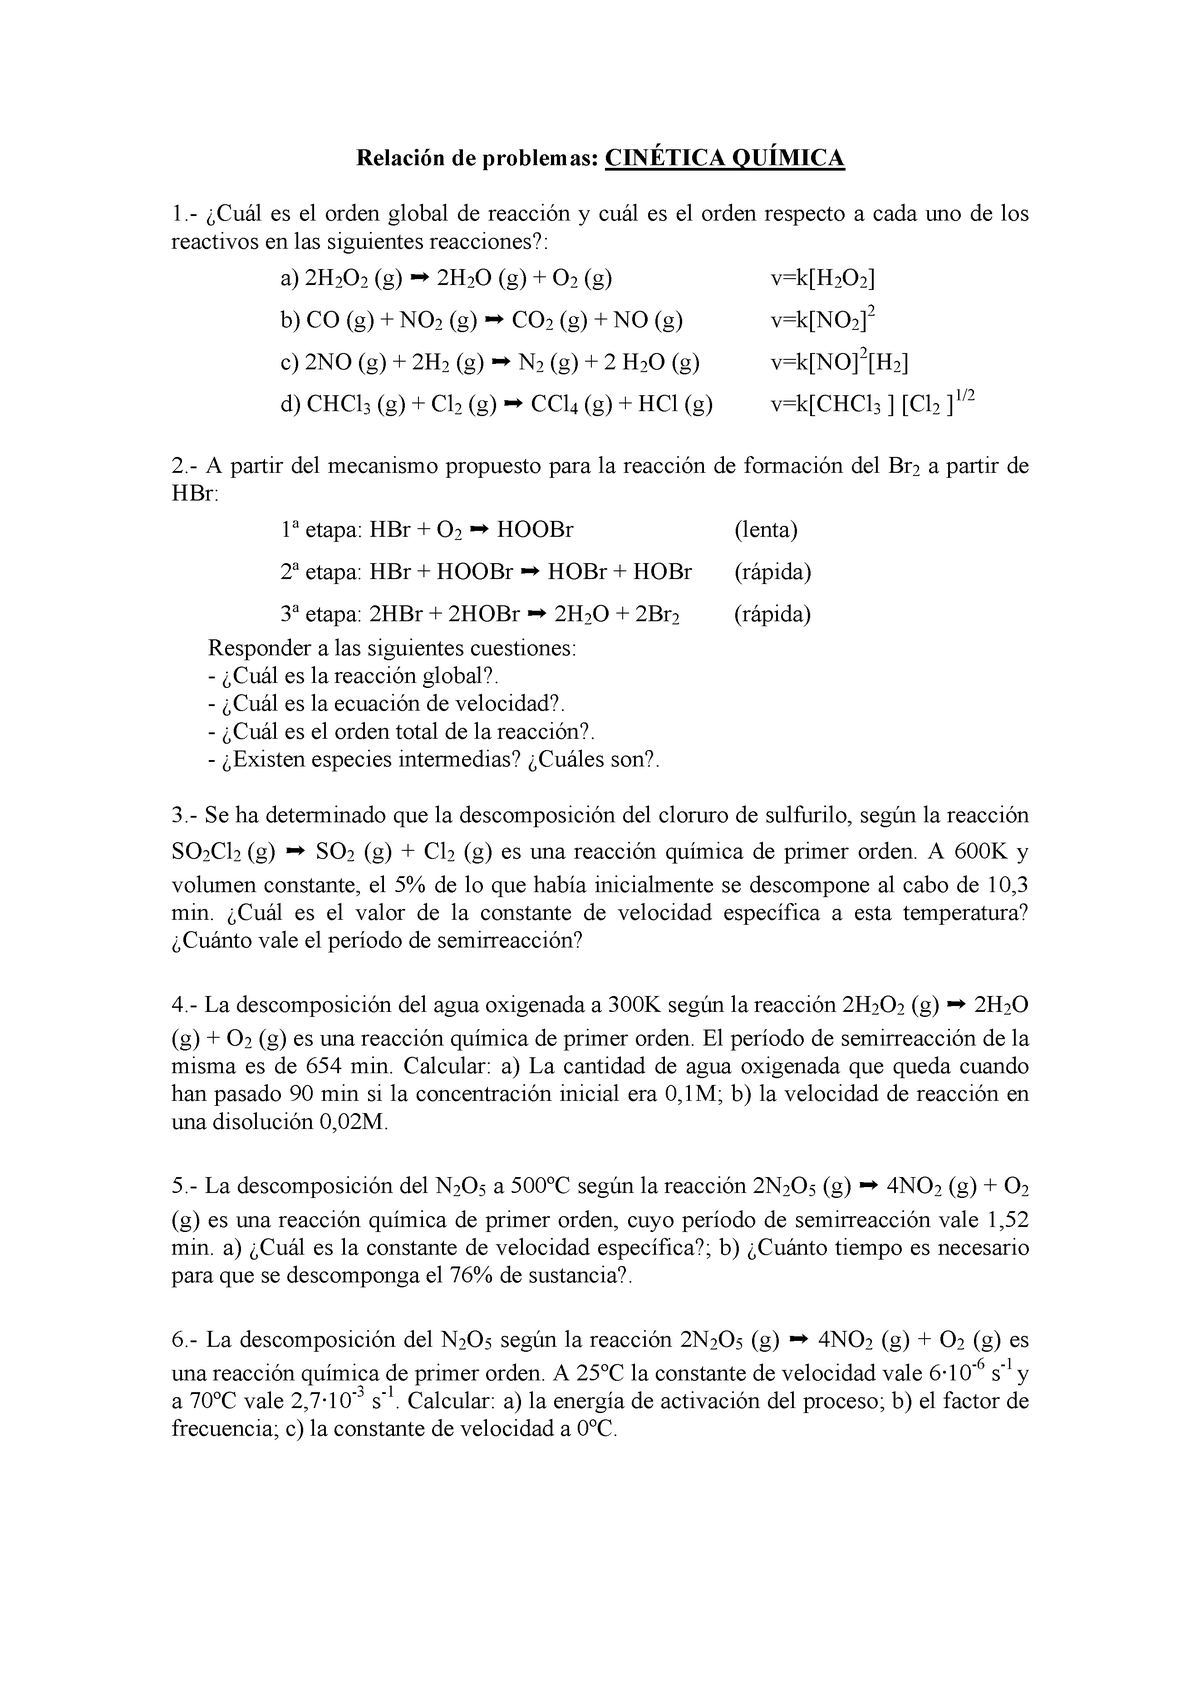 Problemas 9 Chemistry 10211003 Ujaen Studocu